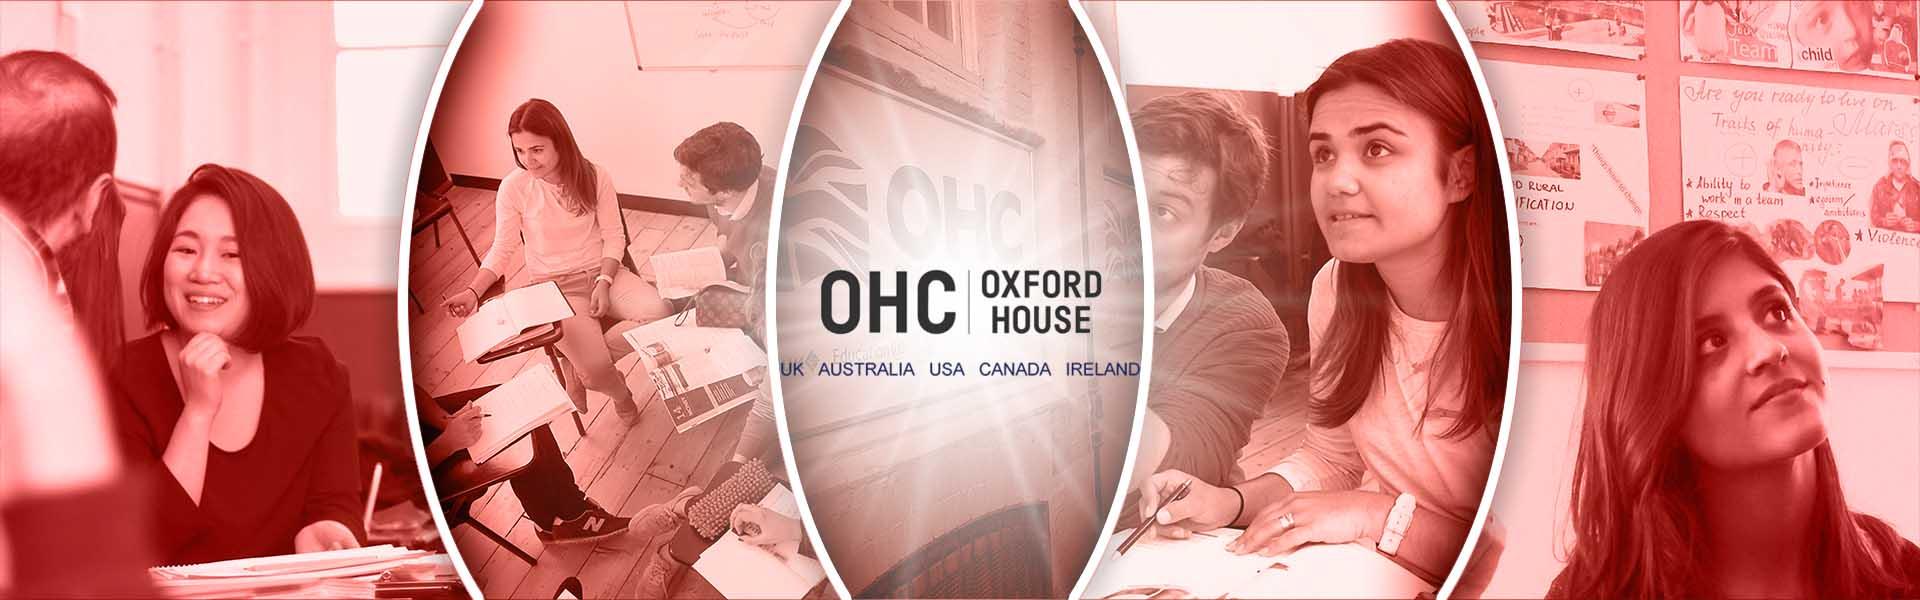 OHC London Oxford Street Dil Okulu